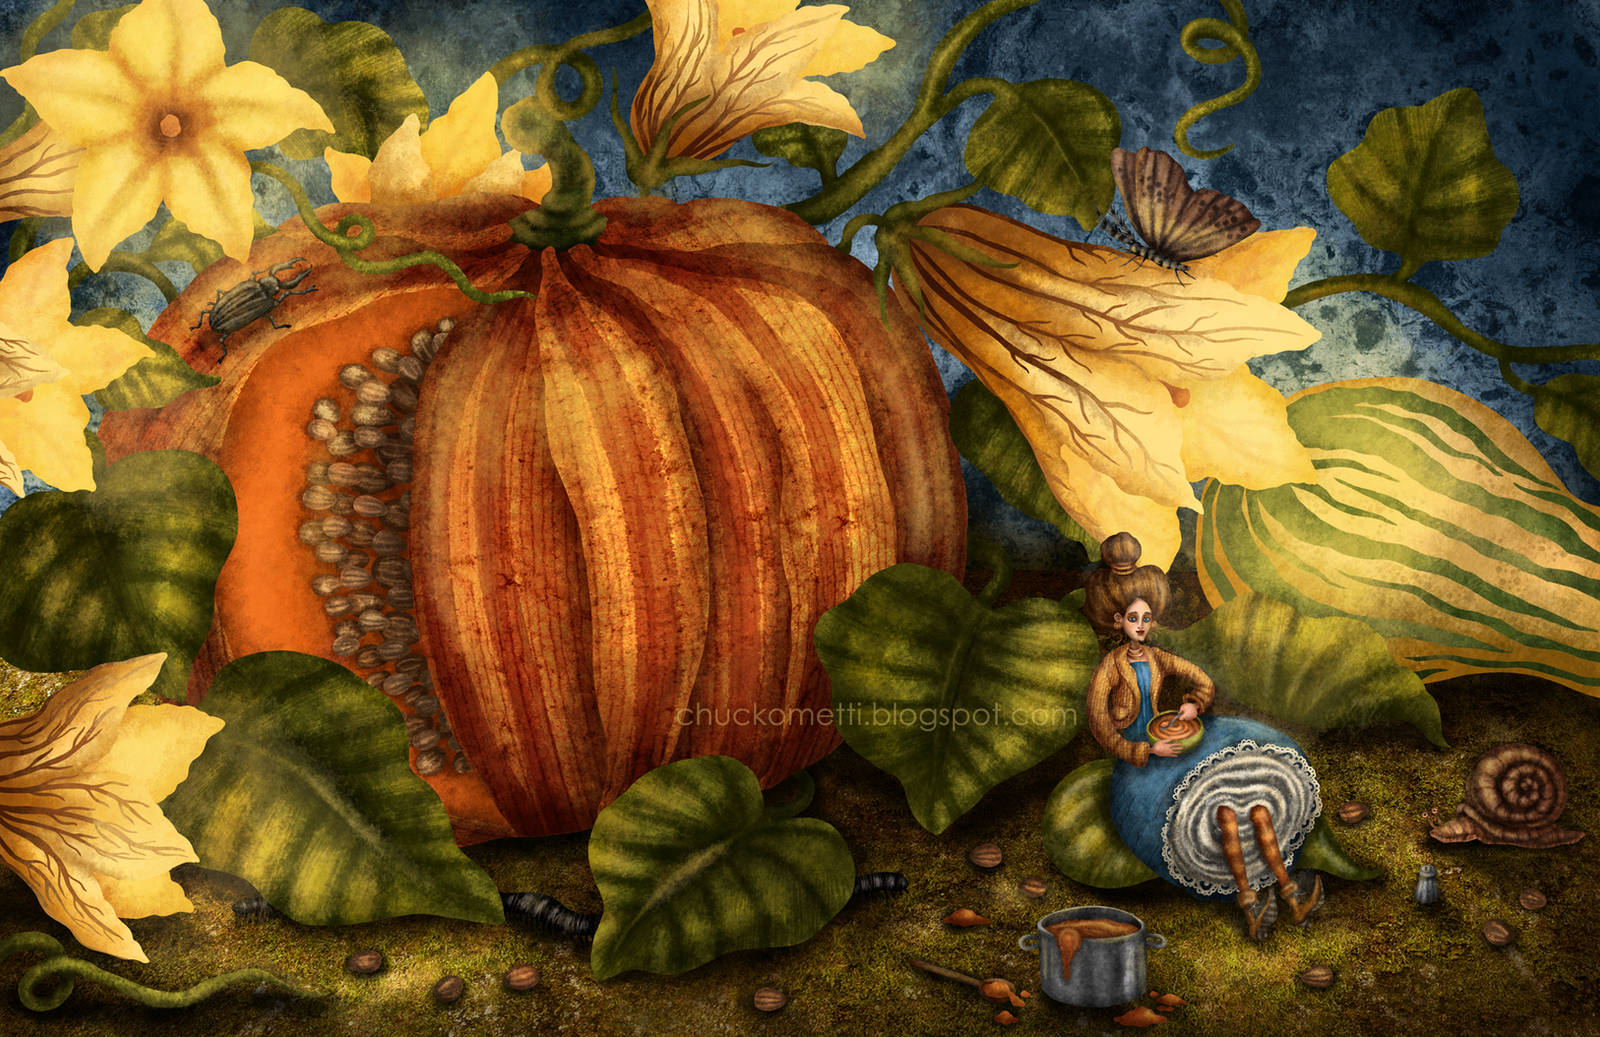 Pumpkin Soup by chuckometti